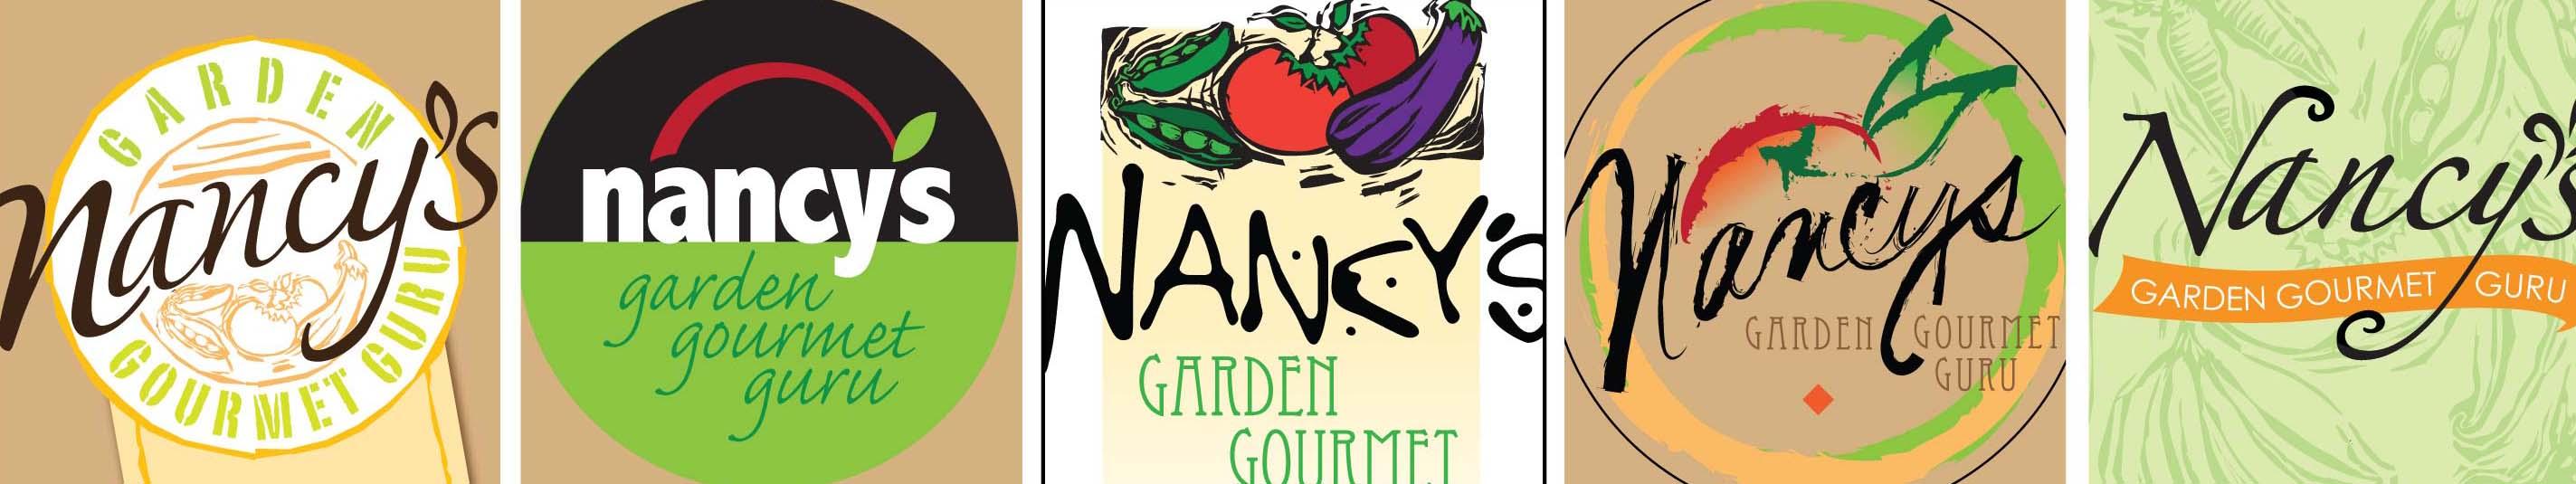 Garden Graphic Design indoor garden party graphic design We Presented Several Graphic Design Solutions For Nancys Garden Gourmet Logo Design